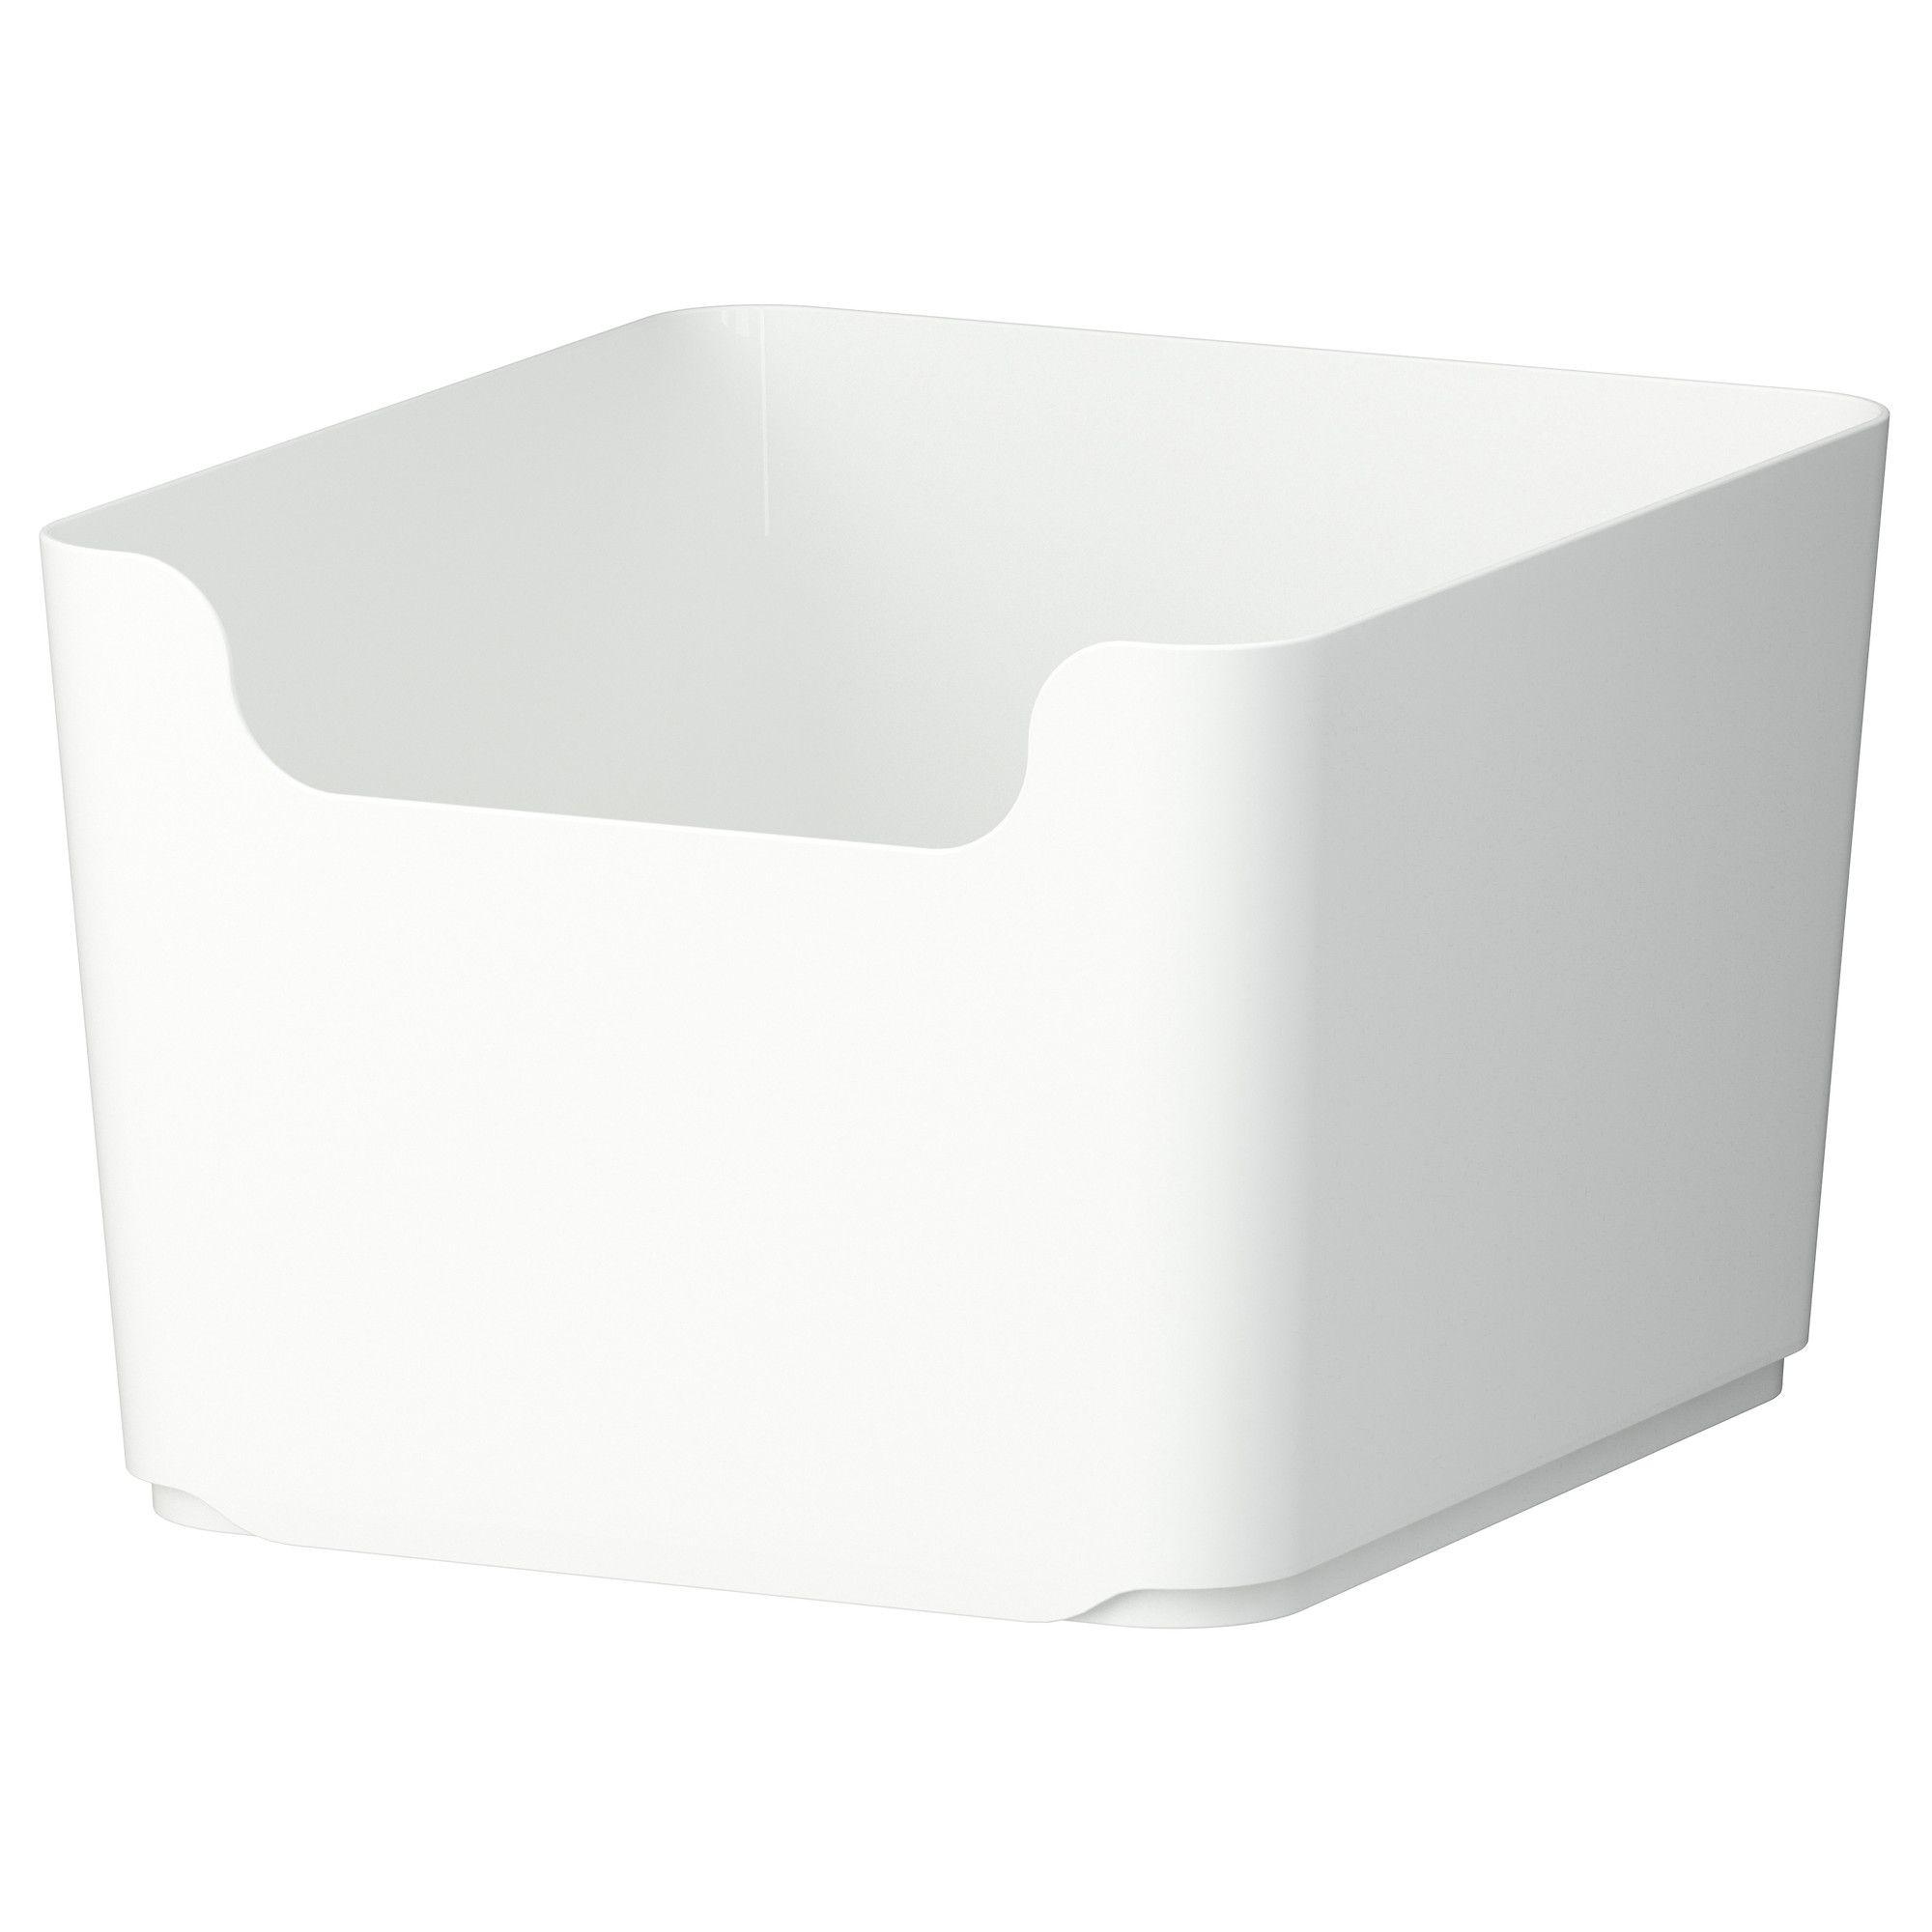 Pluggis Recycling Bin White 4 Gallon Ikea Bacs De Recyclage Ikea Animaux En Plastique